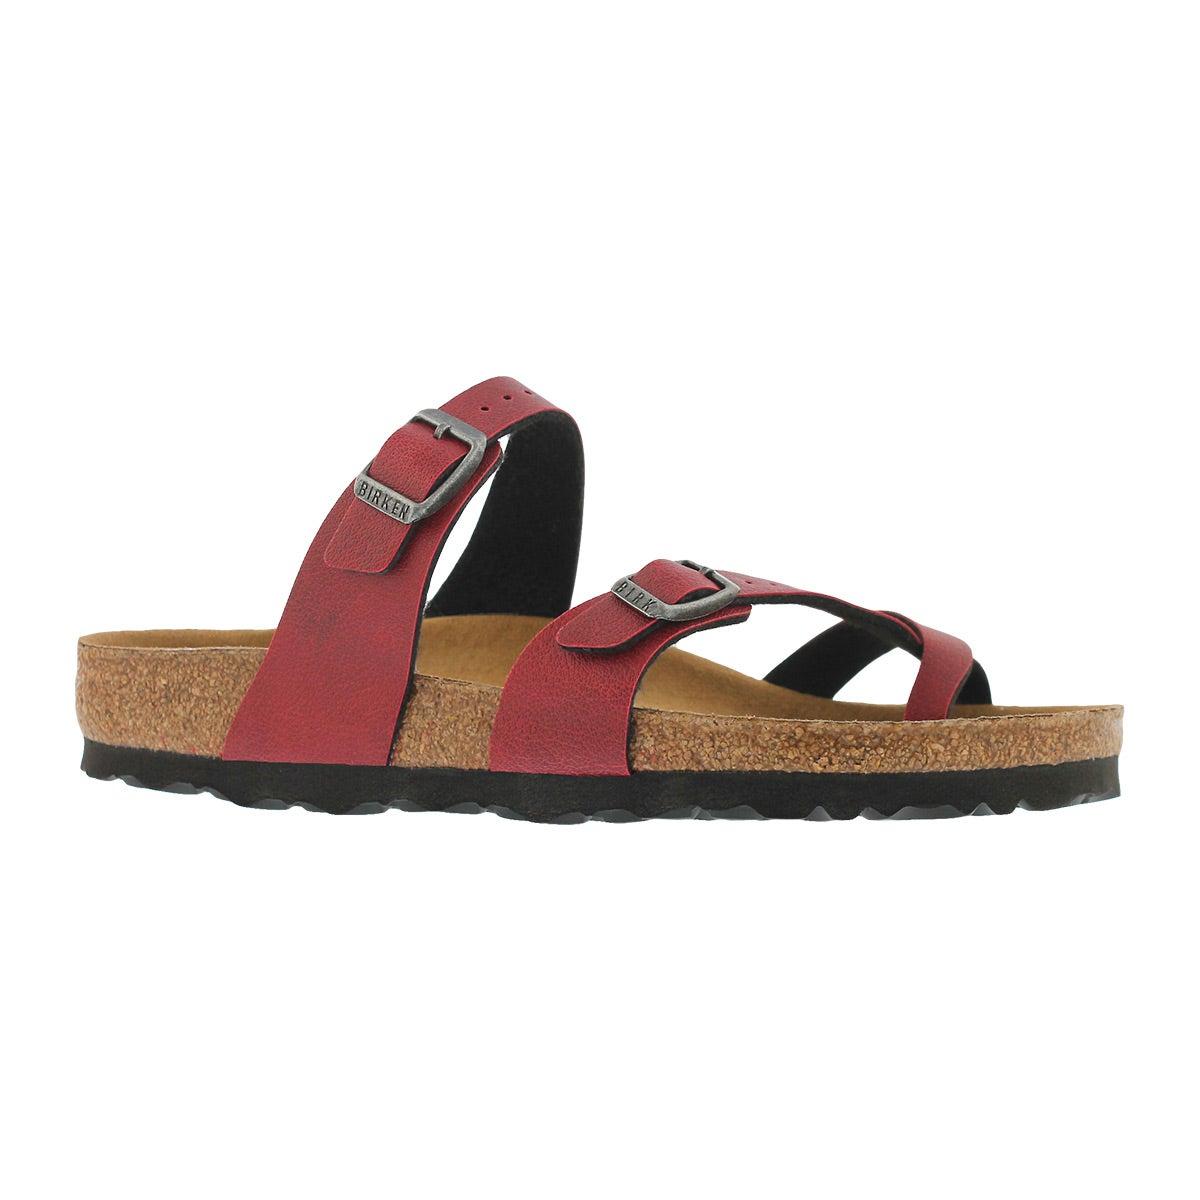 Women's MAYARI VEG BF pullup bordeaux sandals